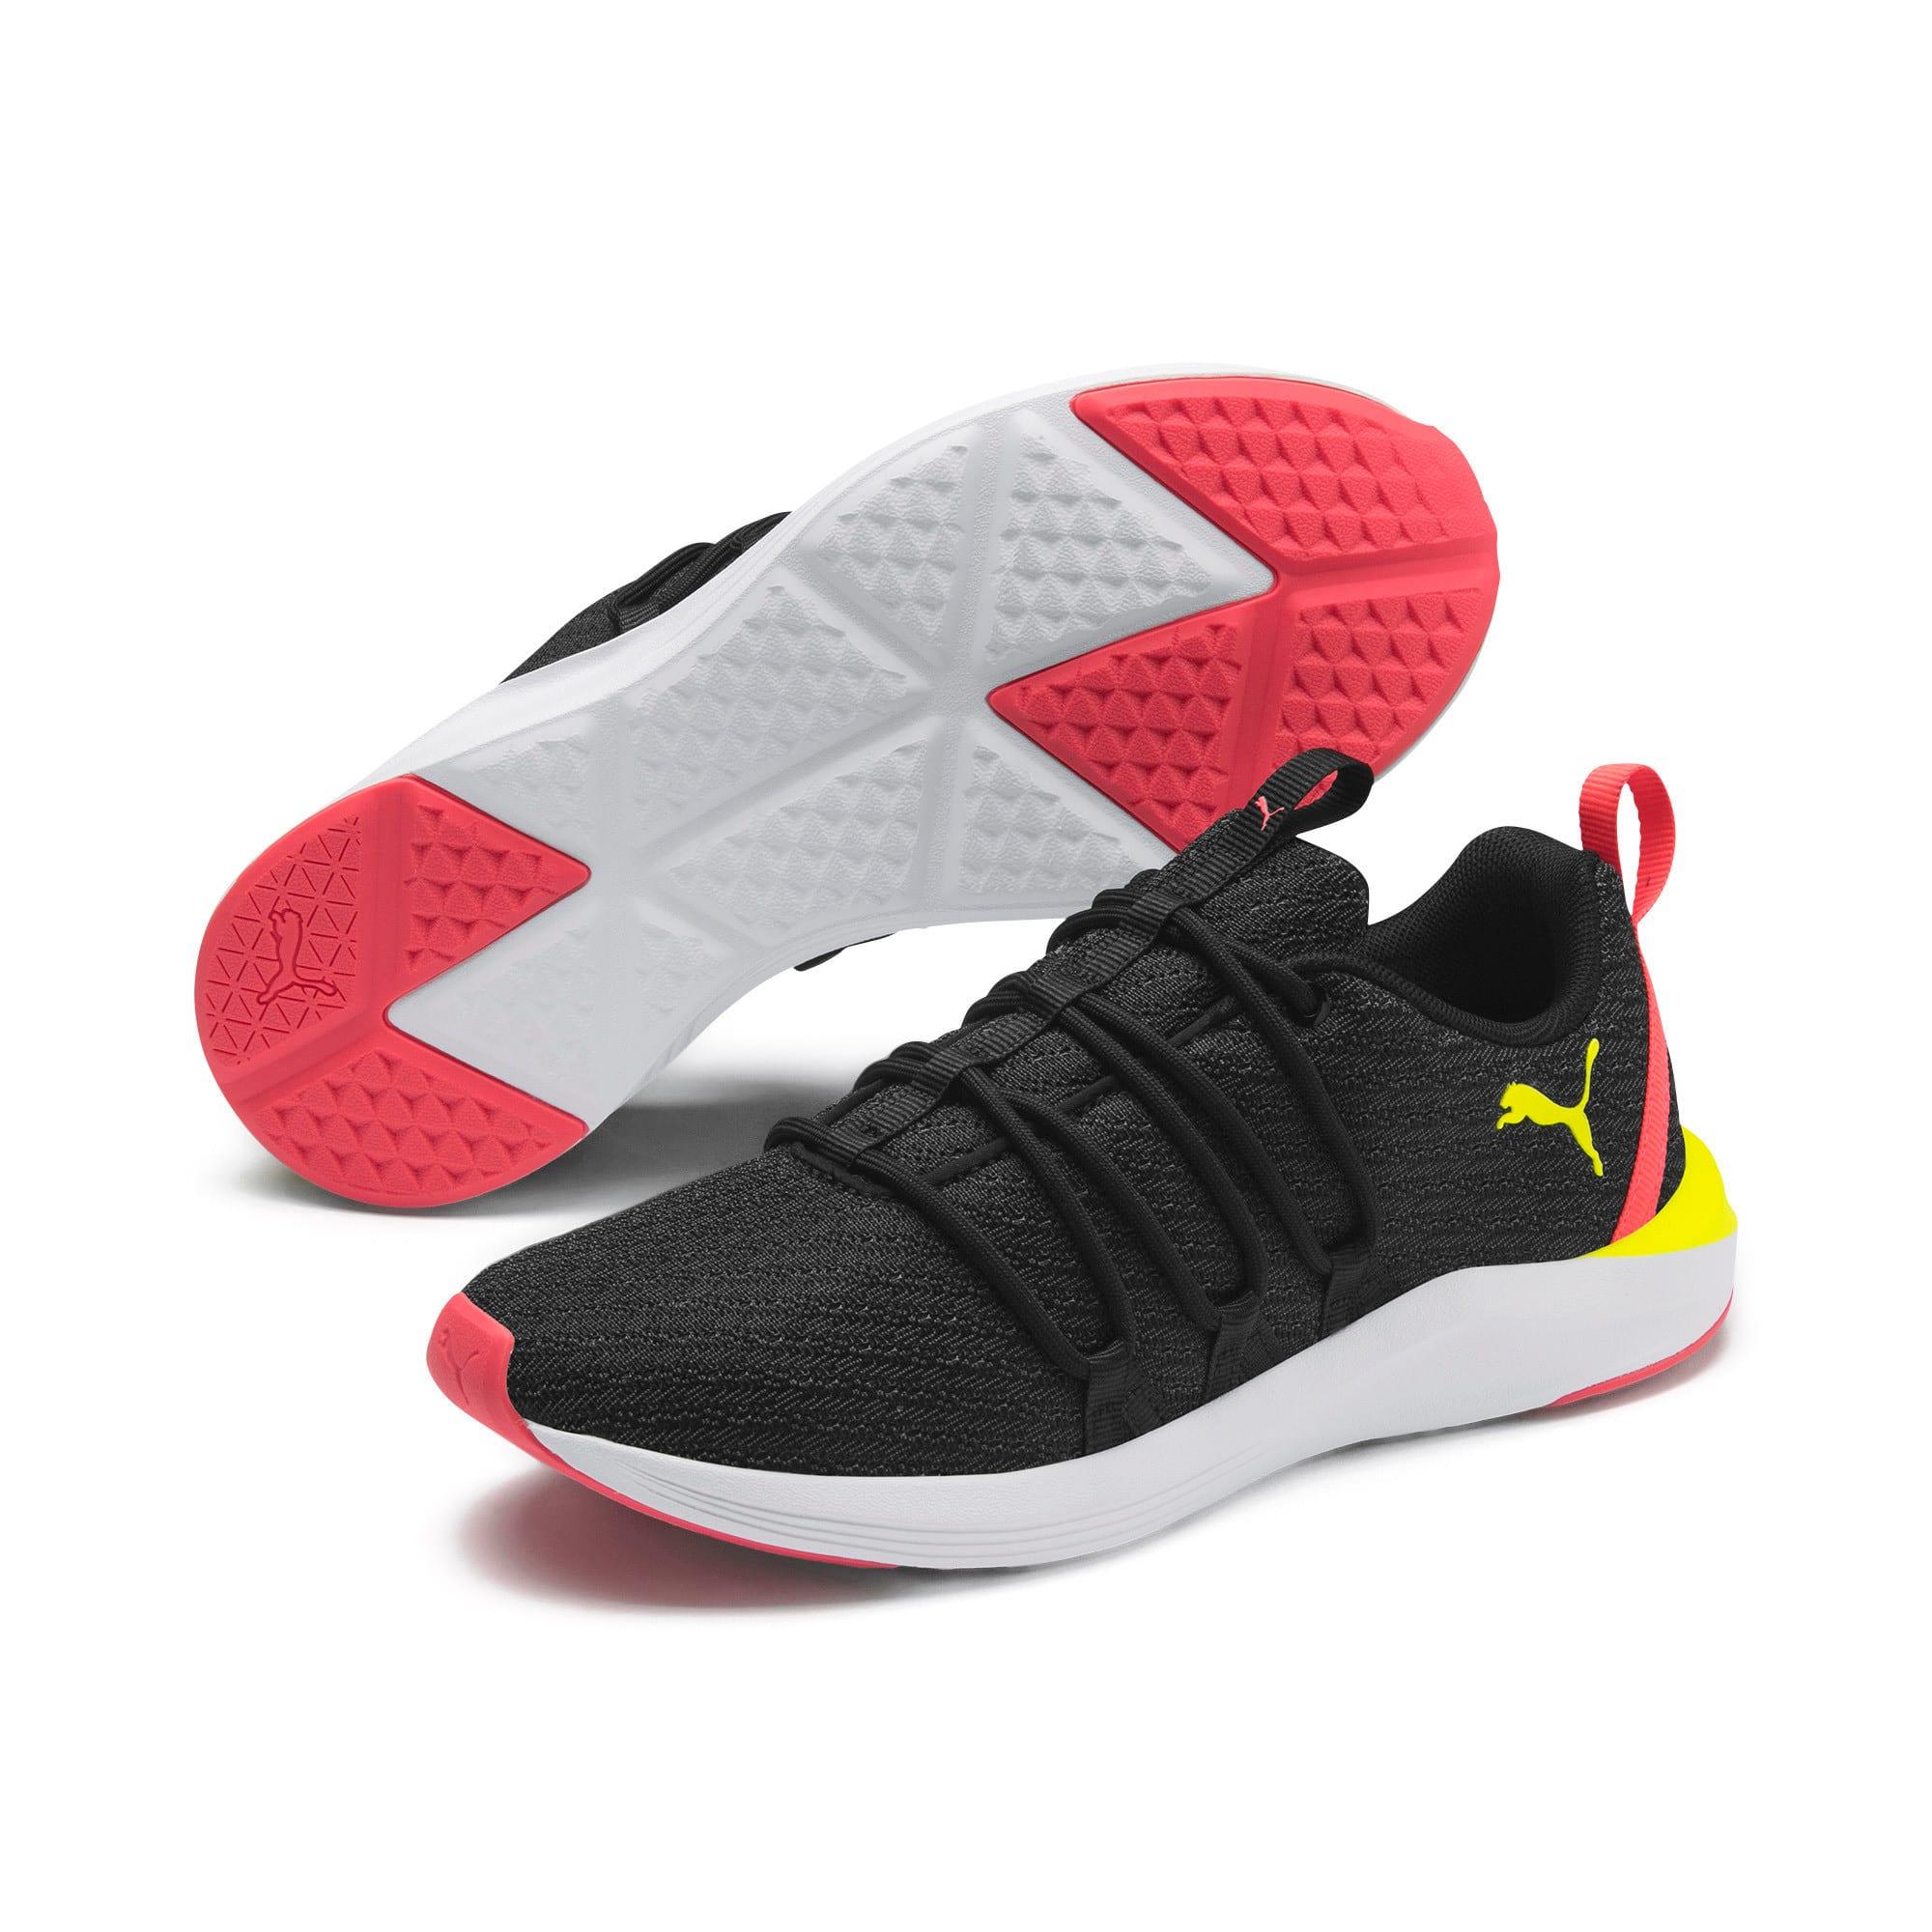 Thumbnail 3 of Prowl Alt Neon Women's Training Shoes, Puma Black-Yellow Alert, medium